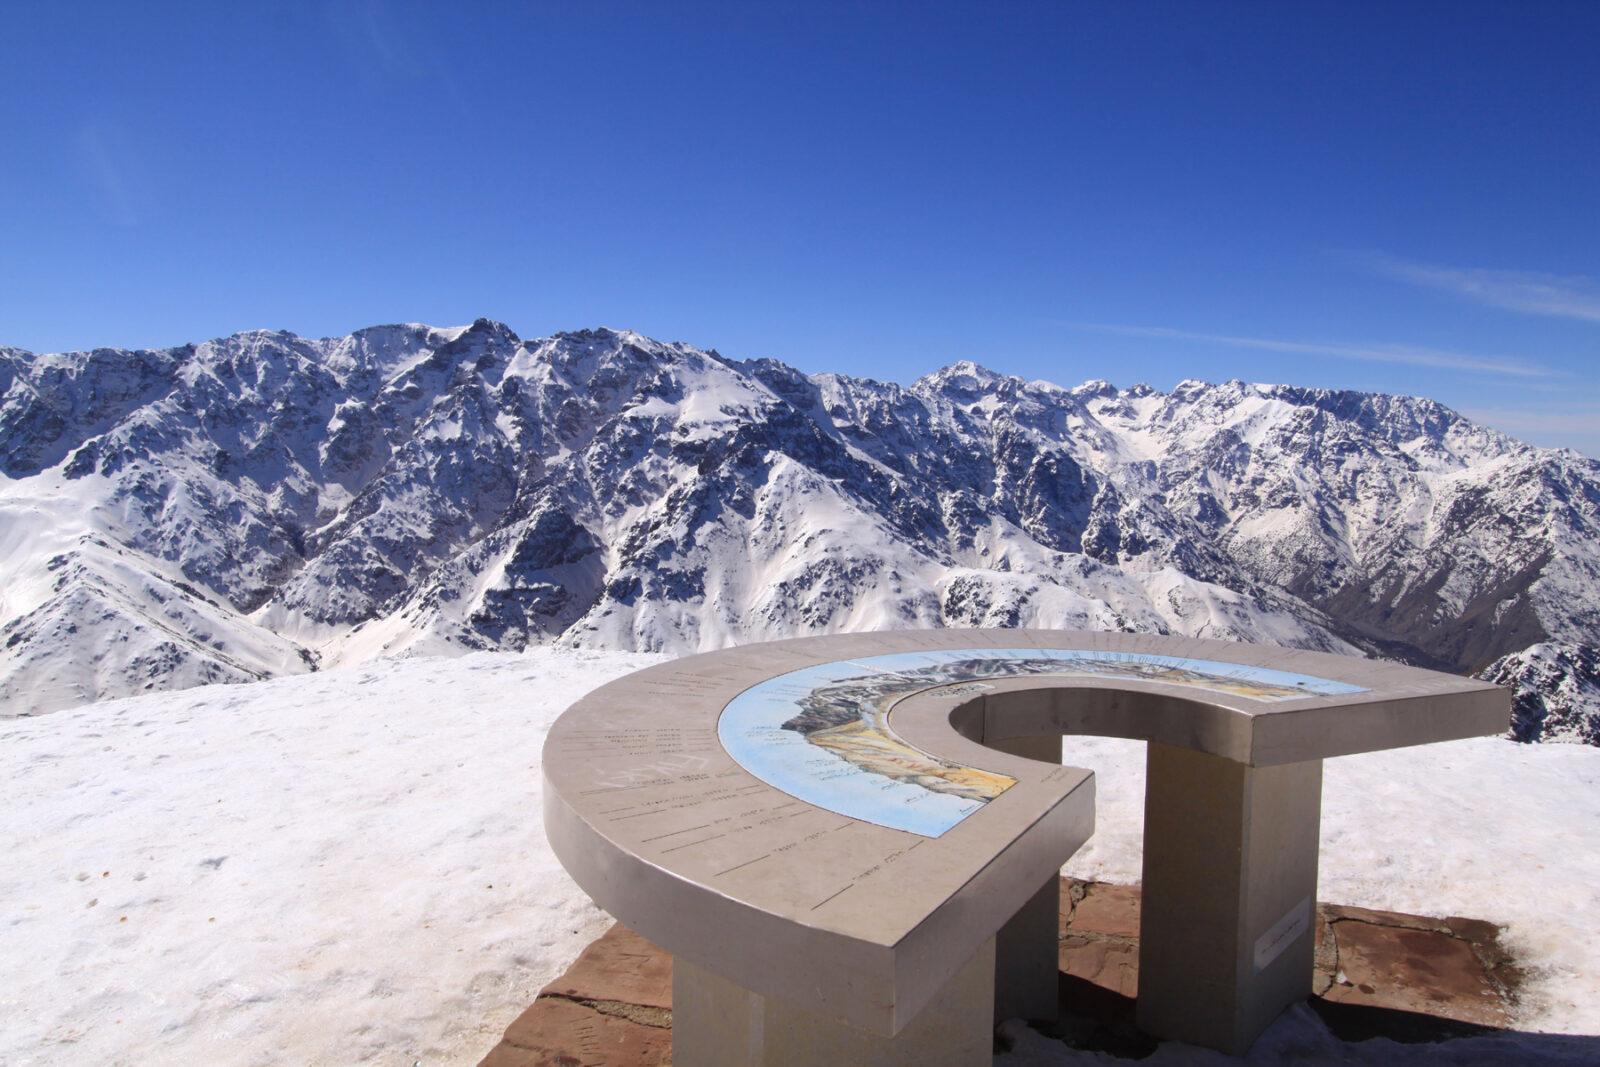 Mountain Toubkal Ascent